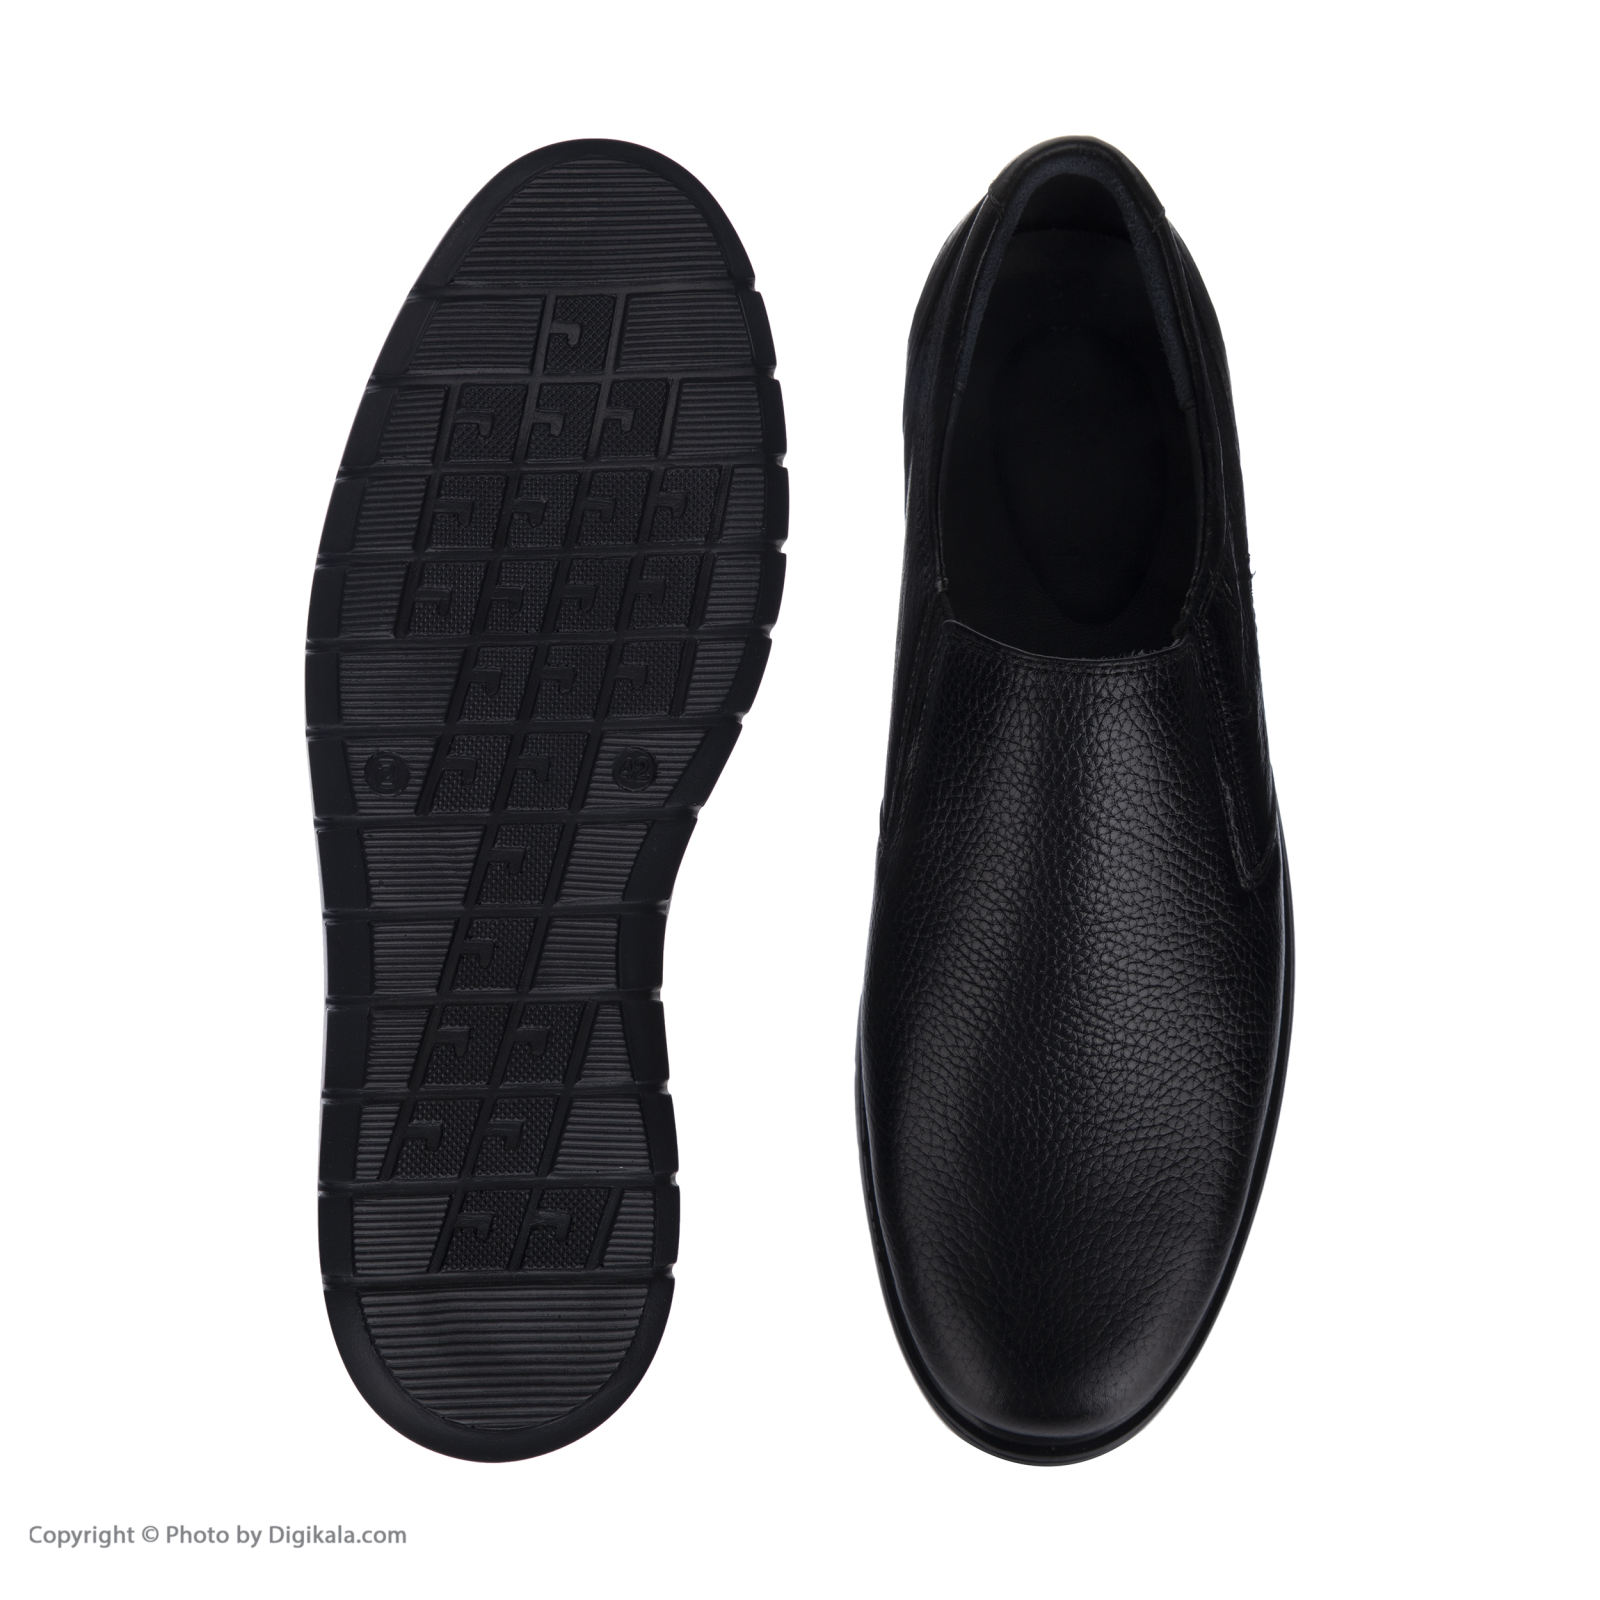 کفش روزمره مردانه دلفارد مدل 8334A503101 -  - 6